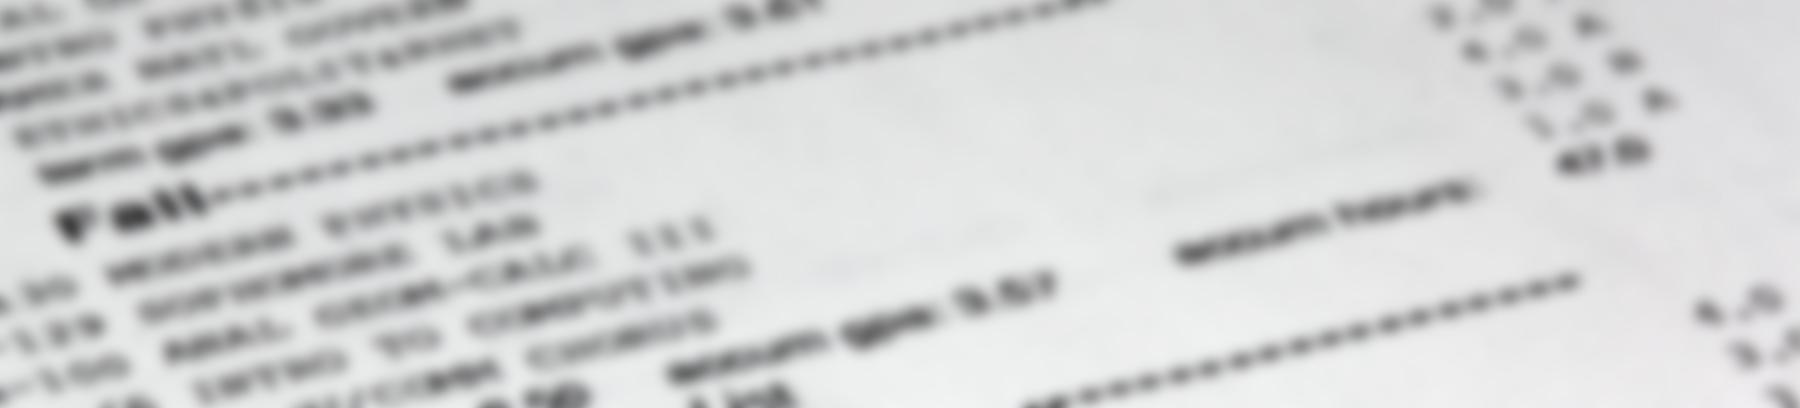 Blurred photo of a college transcript.